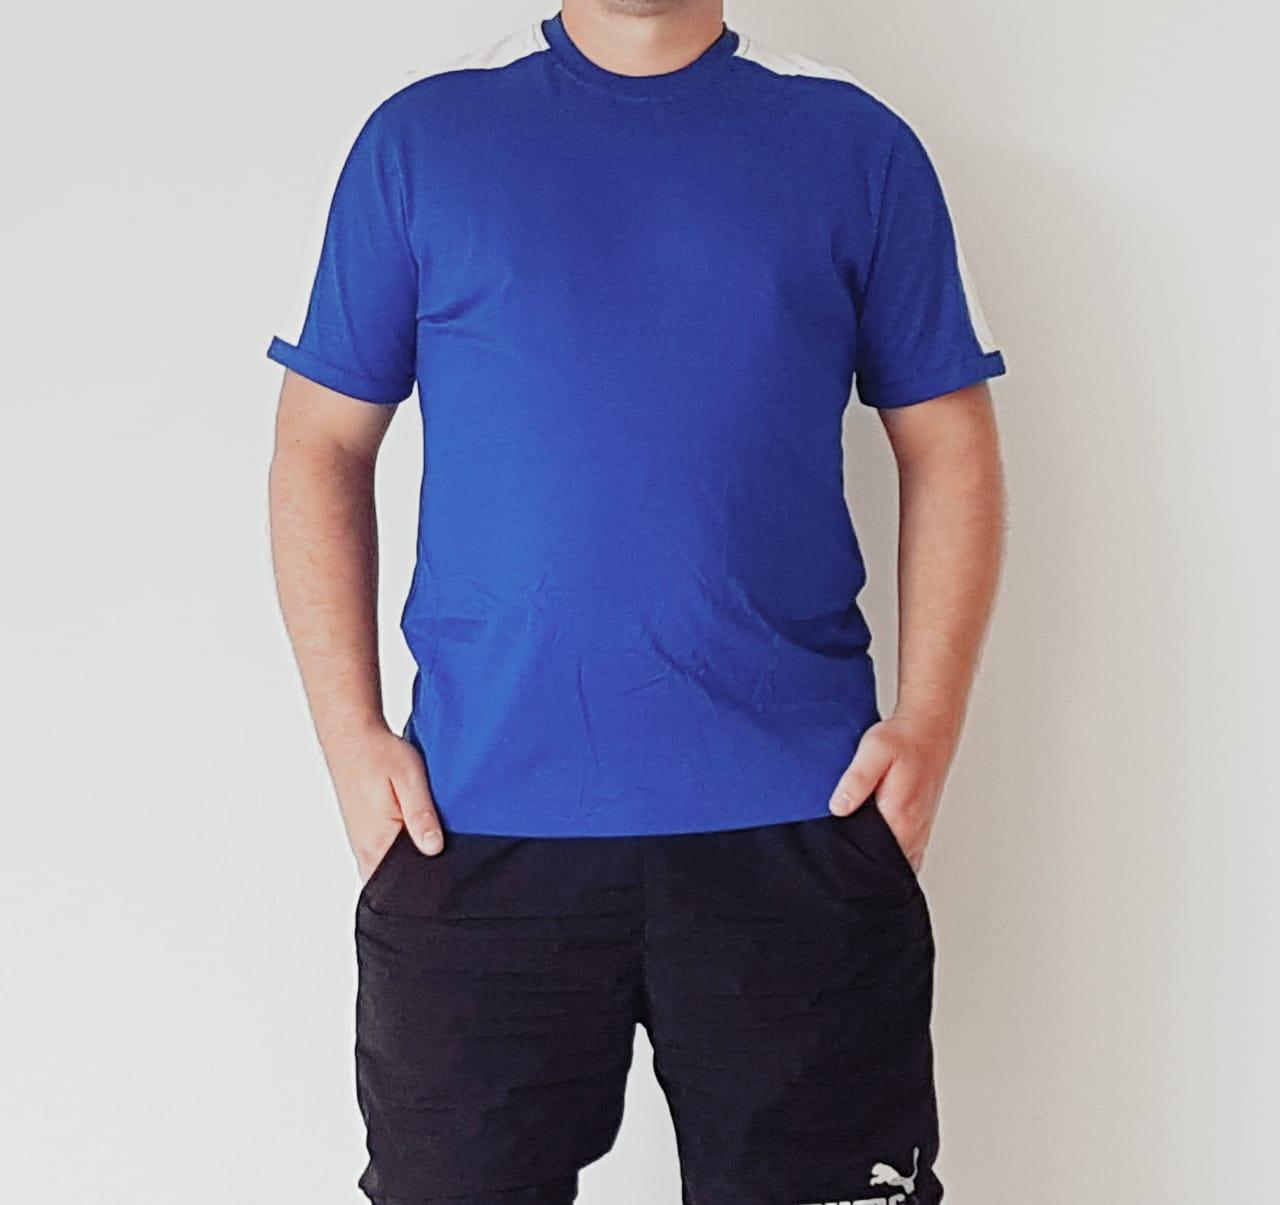 Camiseta Karate Evolution Azul estampa nas costas